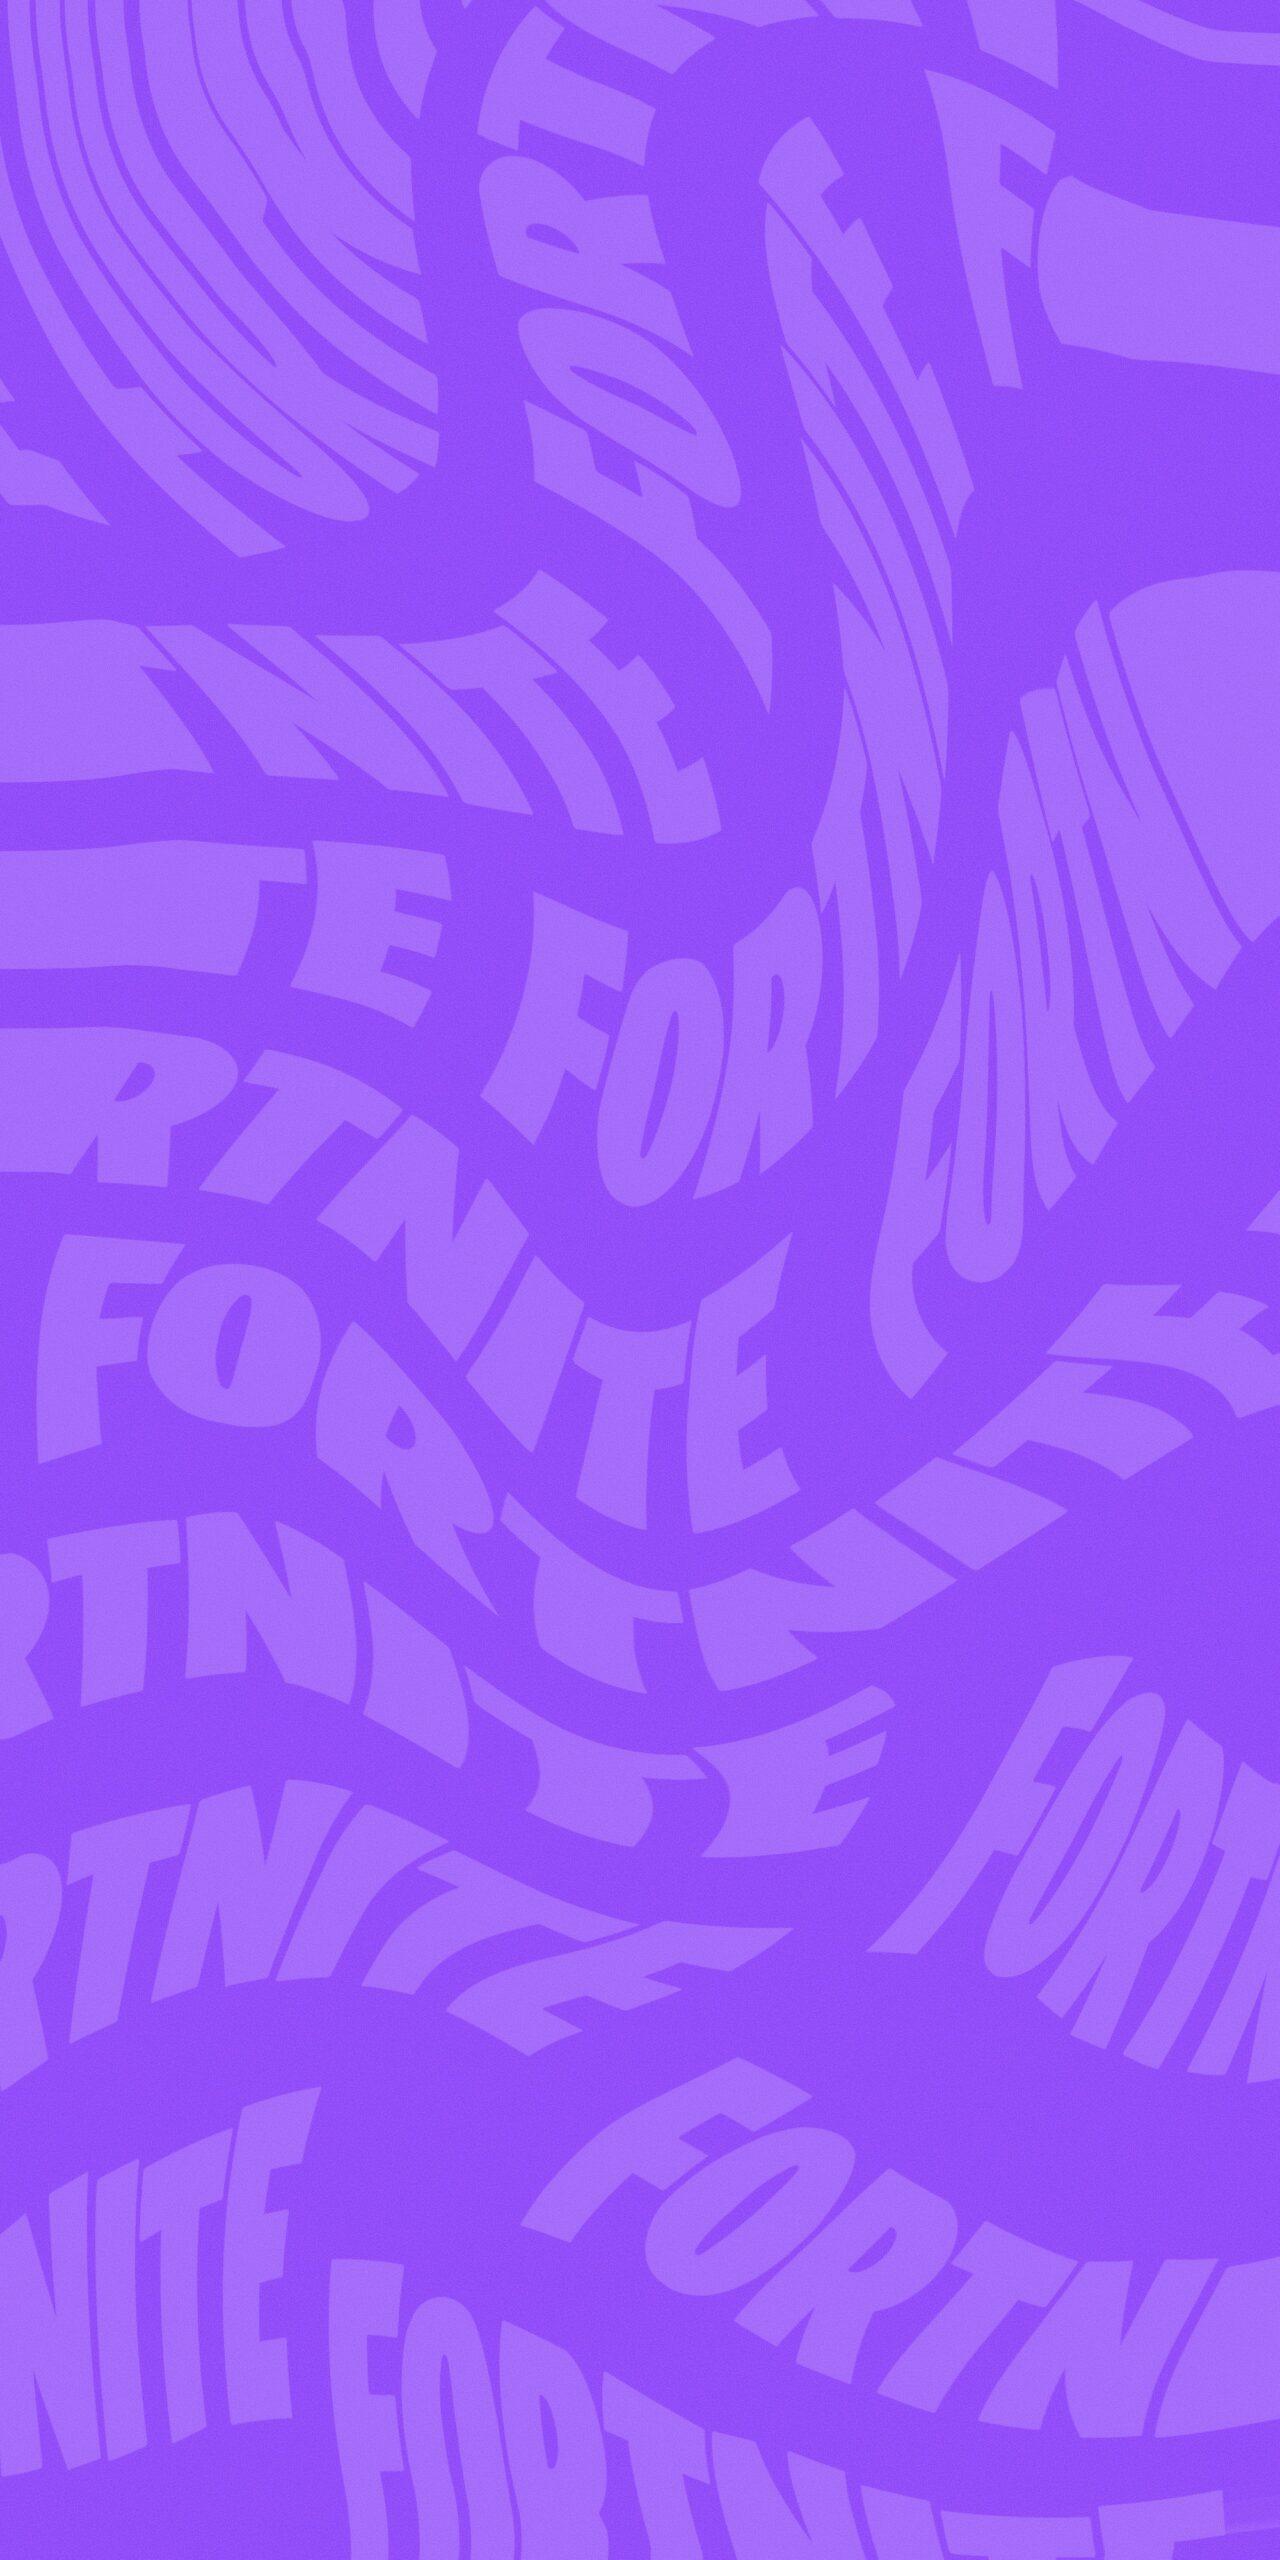 fortnite logo purple background wallpaper